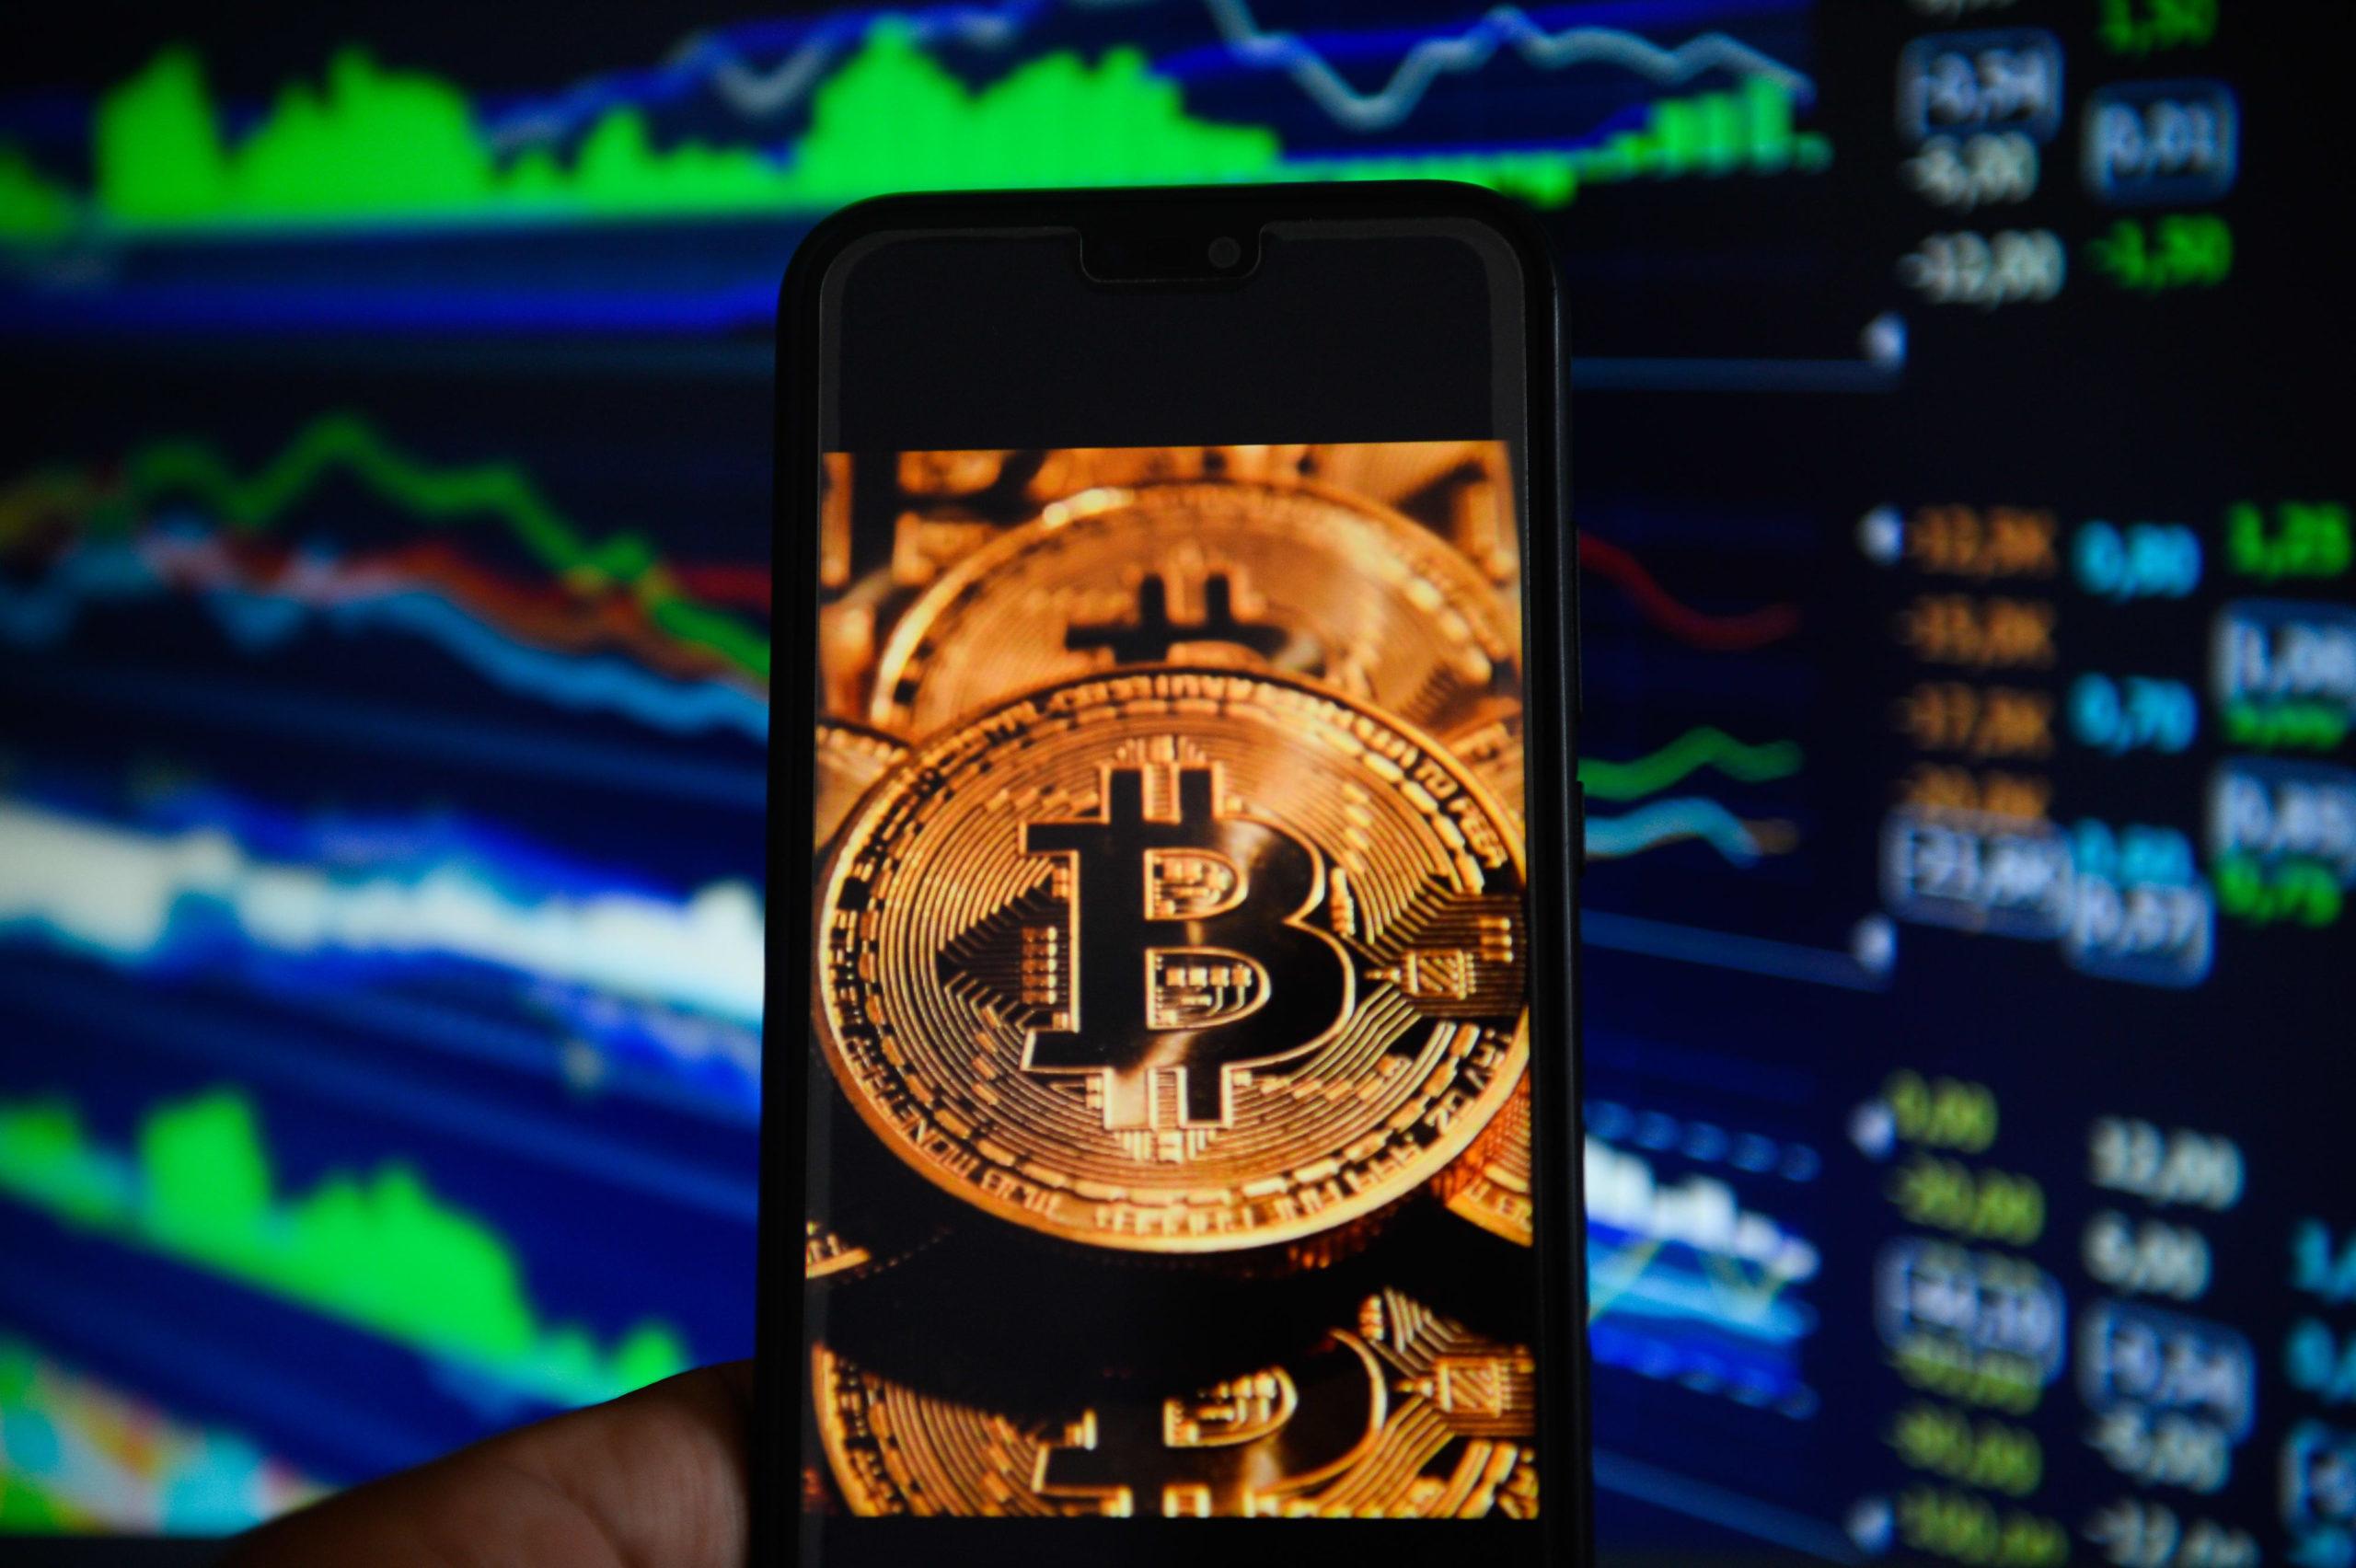 bitcoinokat keresni az ios on